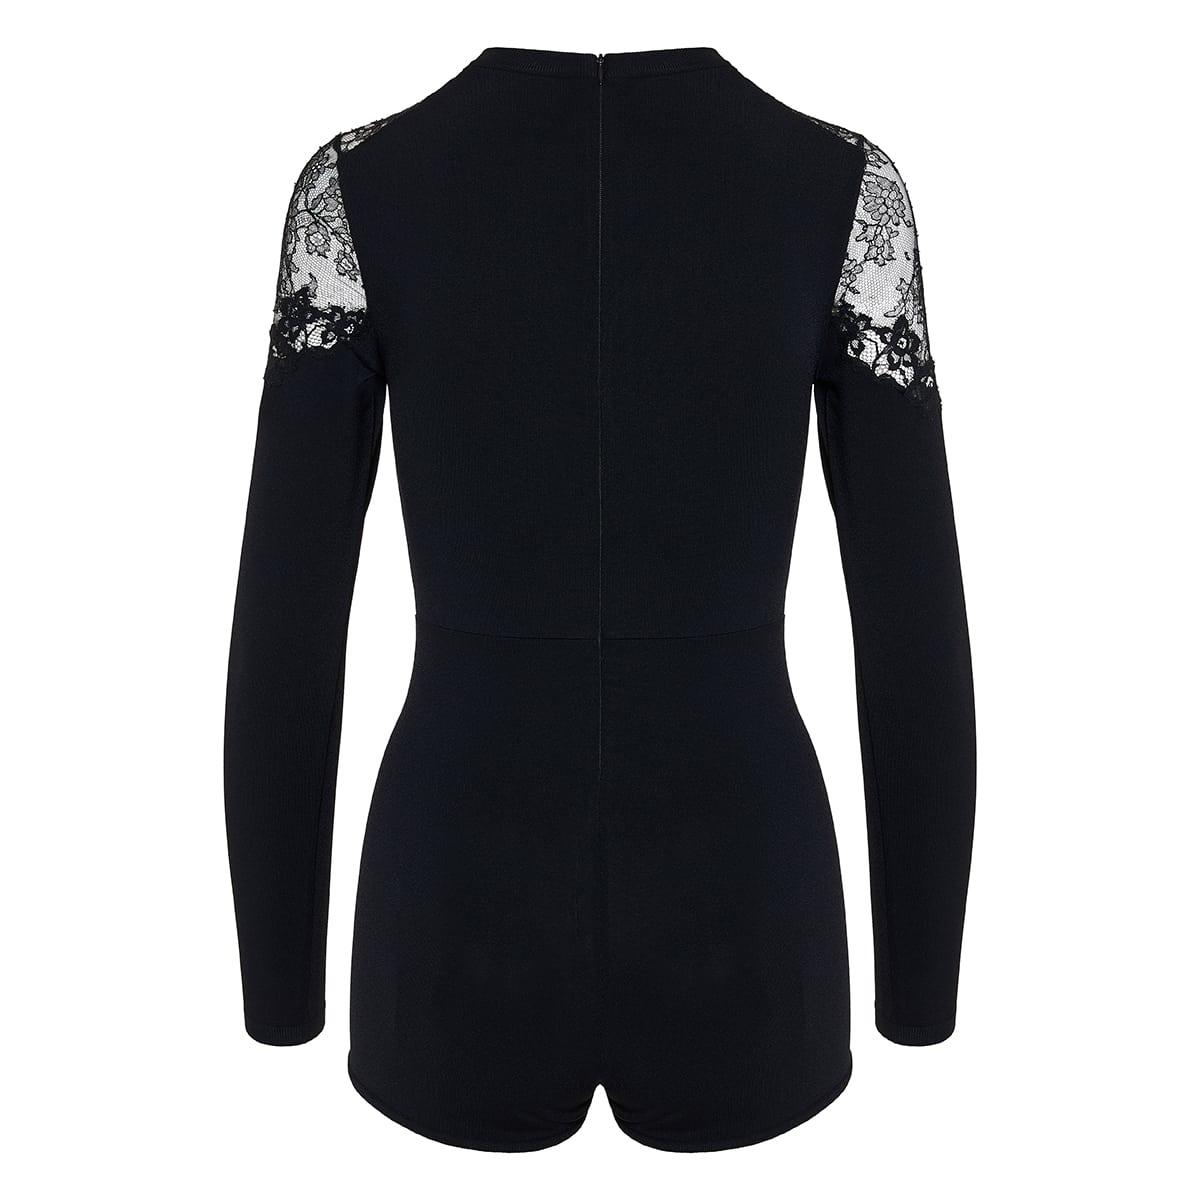 Lace-paneled playsuit